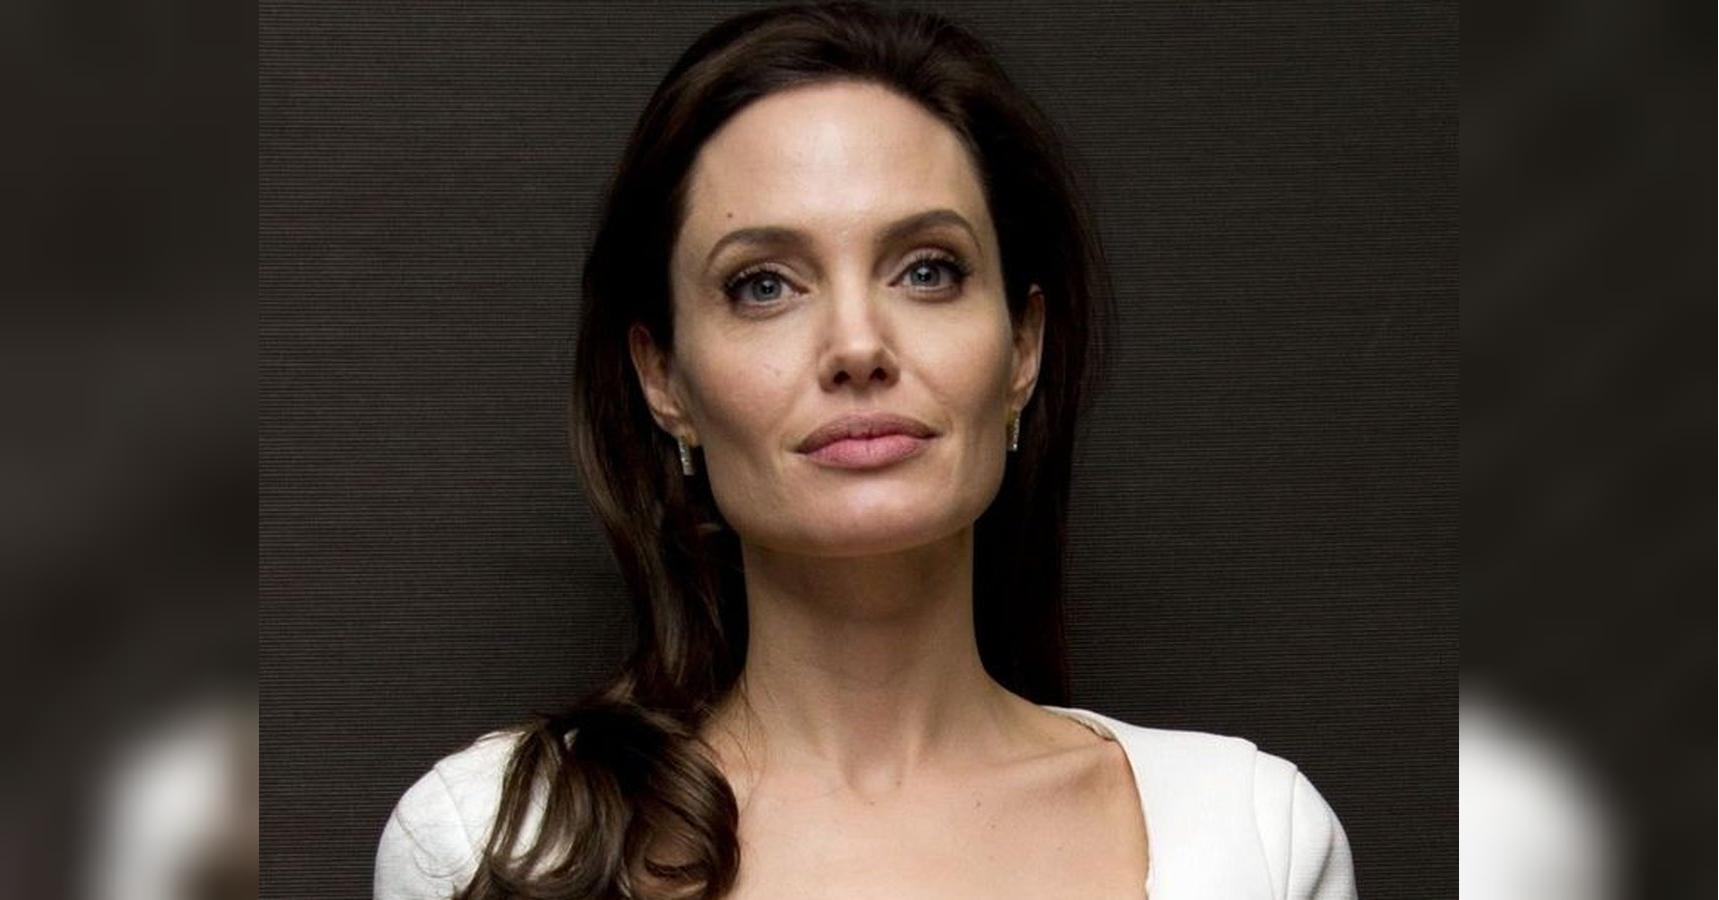 Angelina Jolie Голая Анджелина Джоли снялась голой для обложки журнала madame